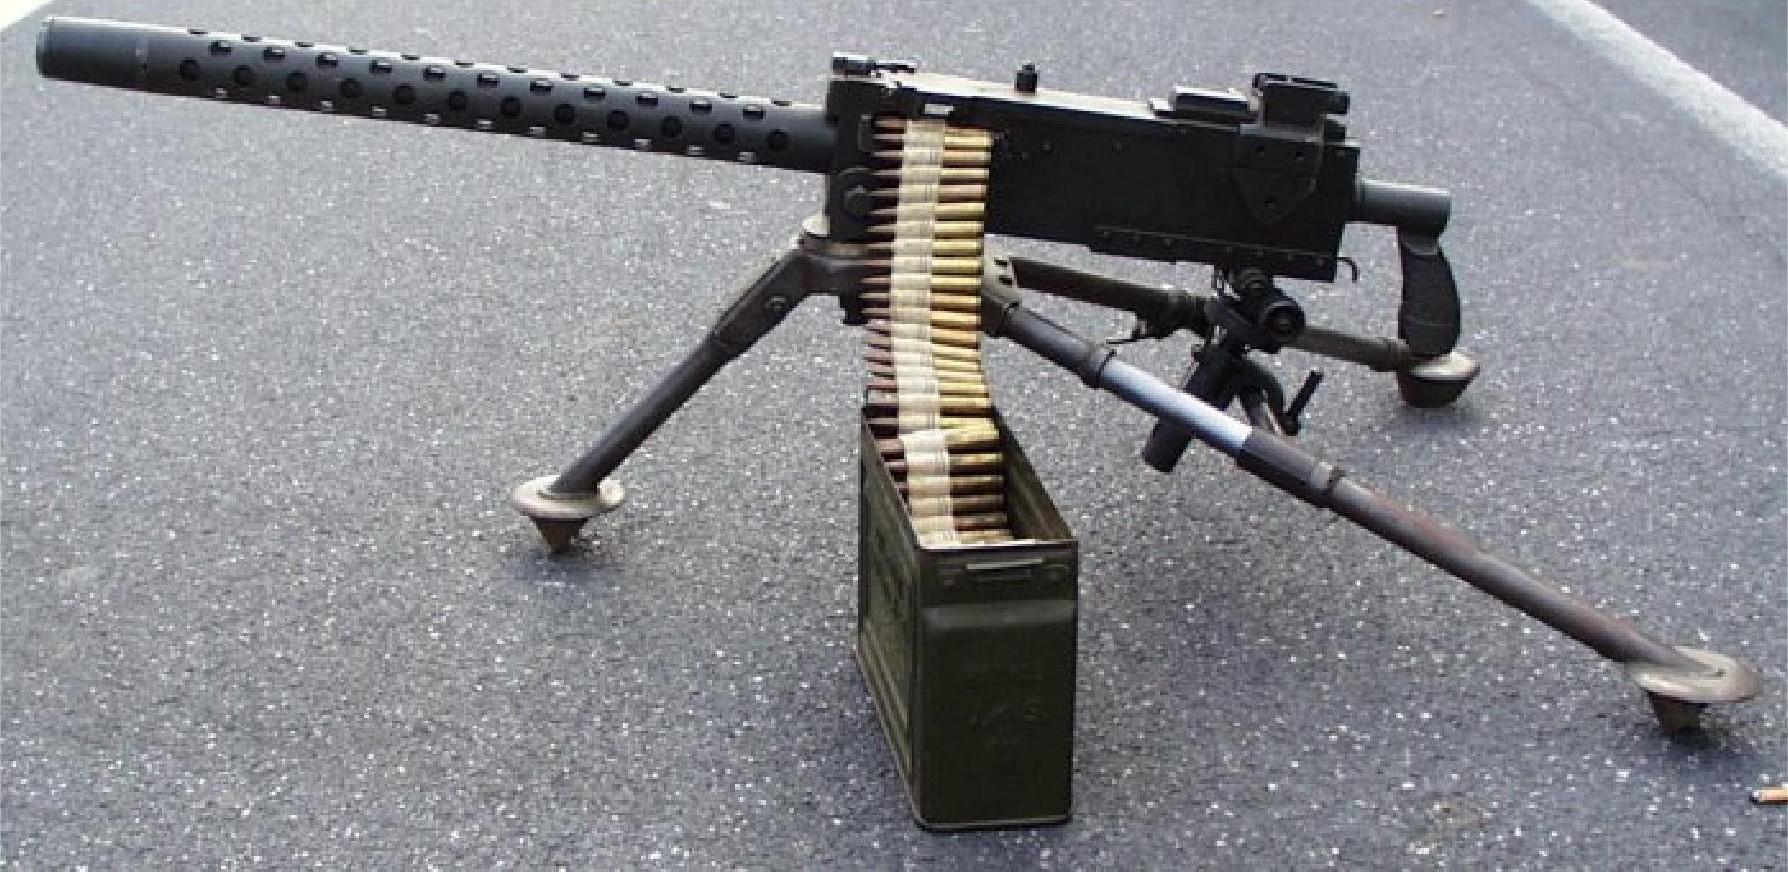 M1919 Browning Machine Gun Backgrounds on Wallpapers Vista